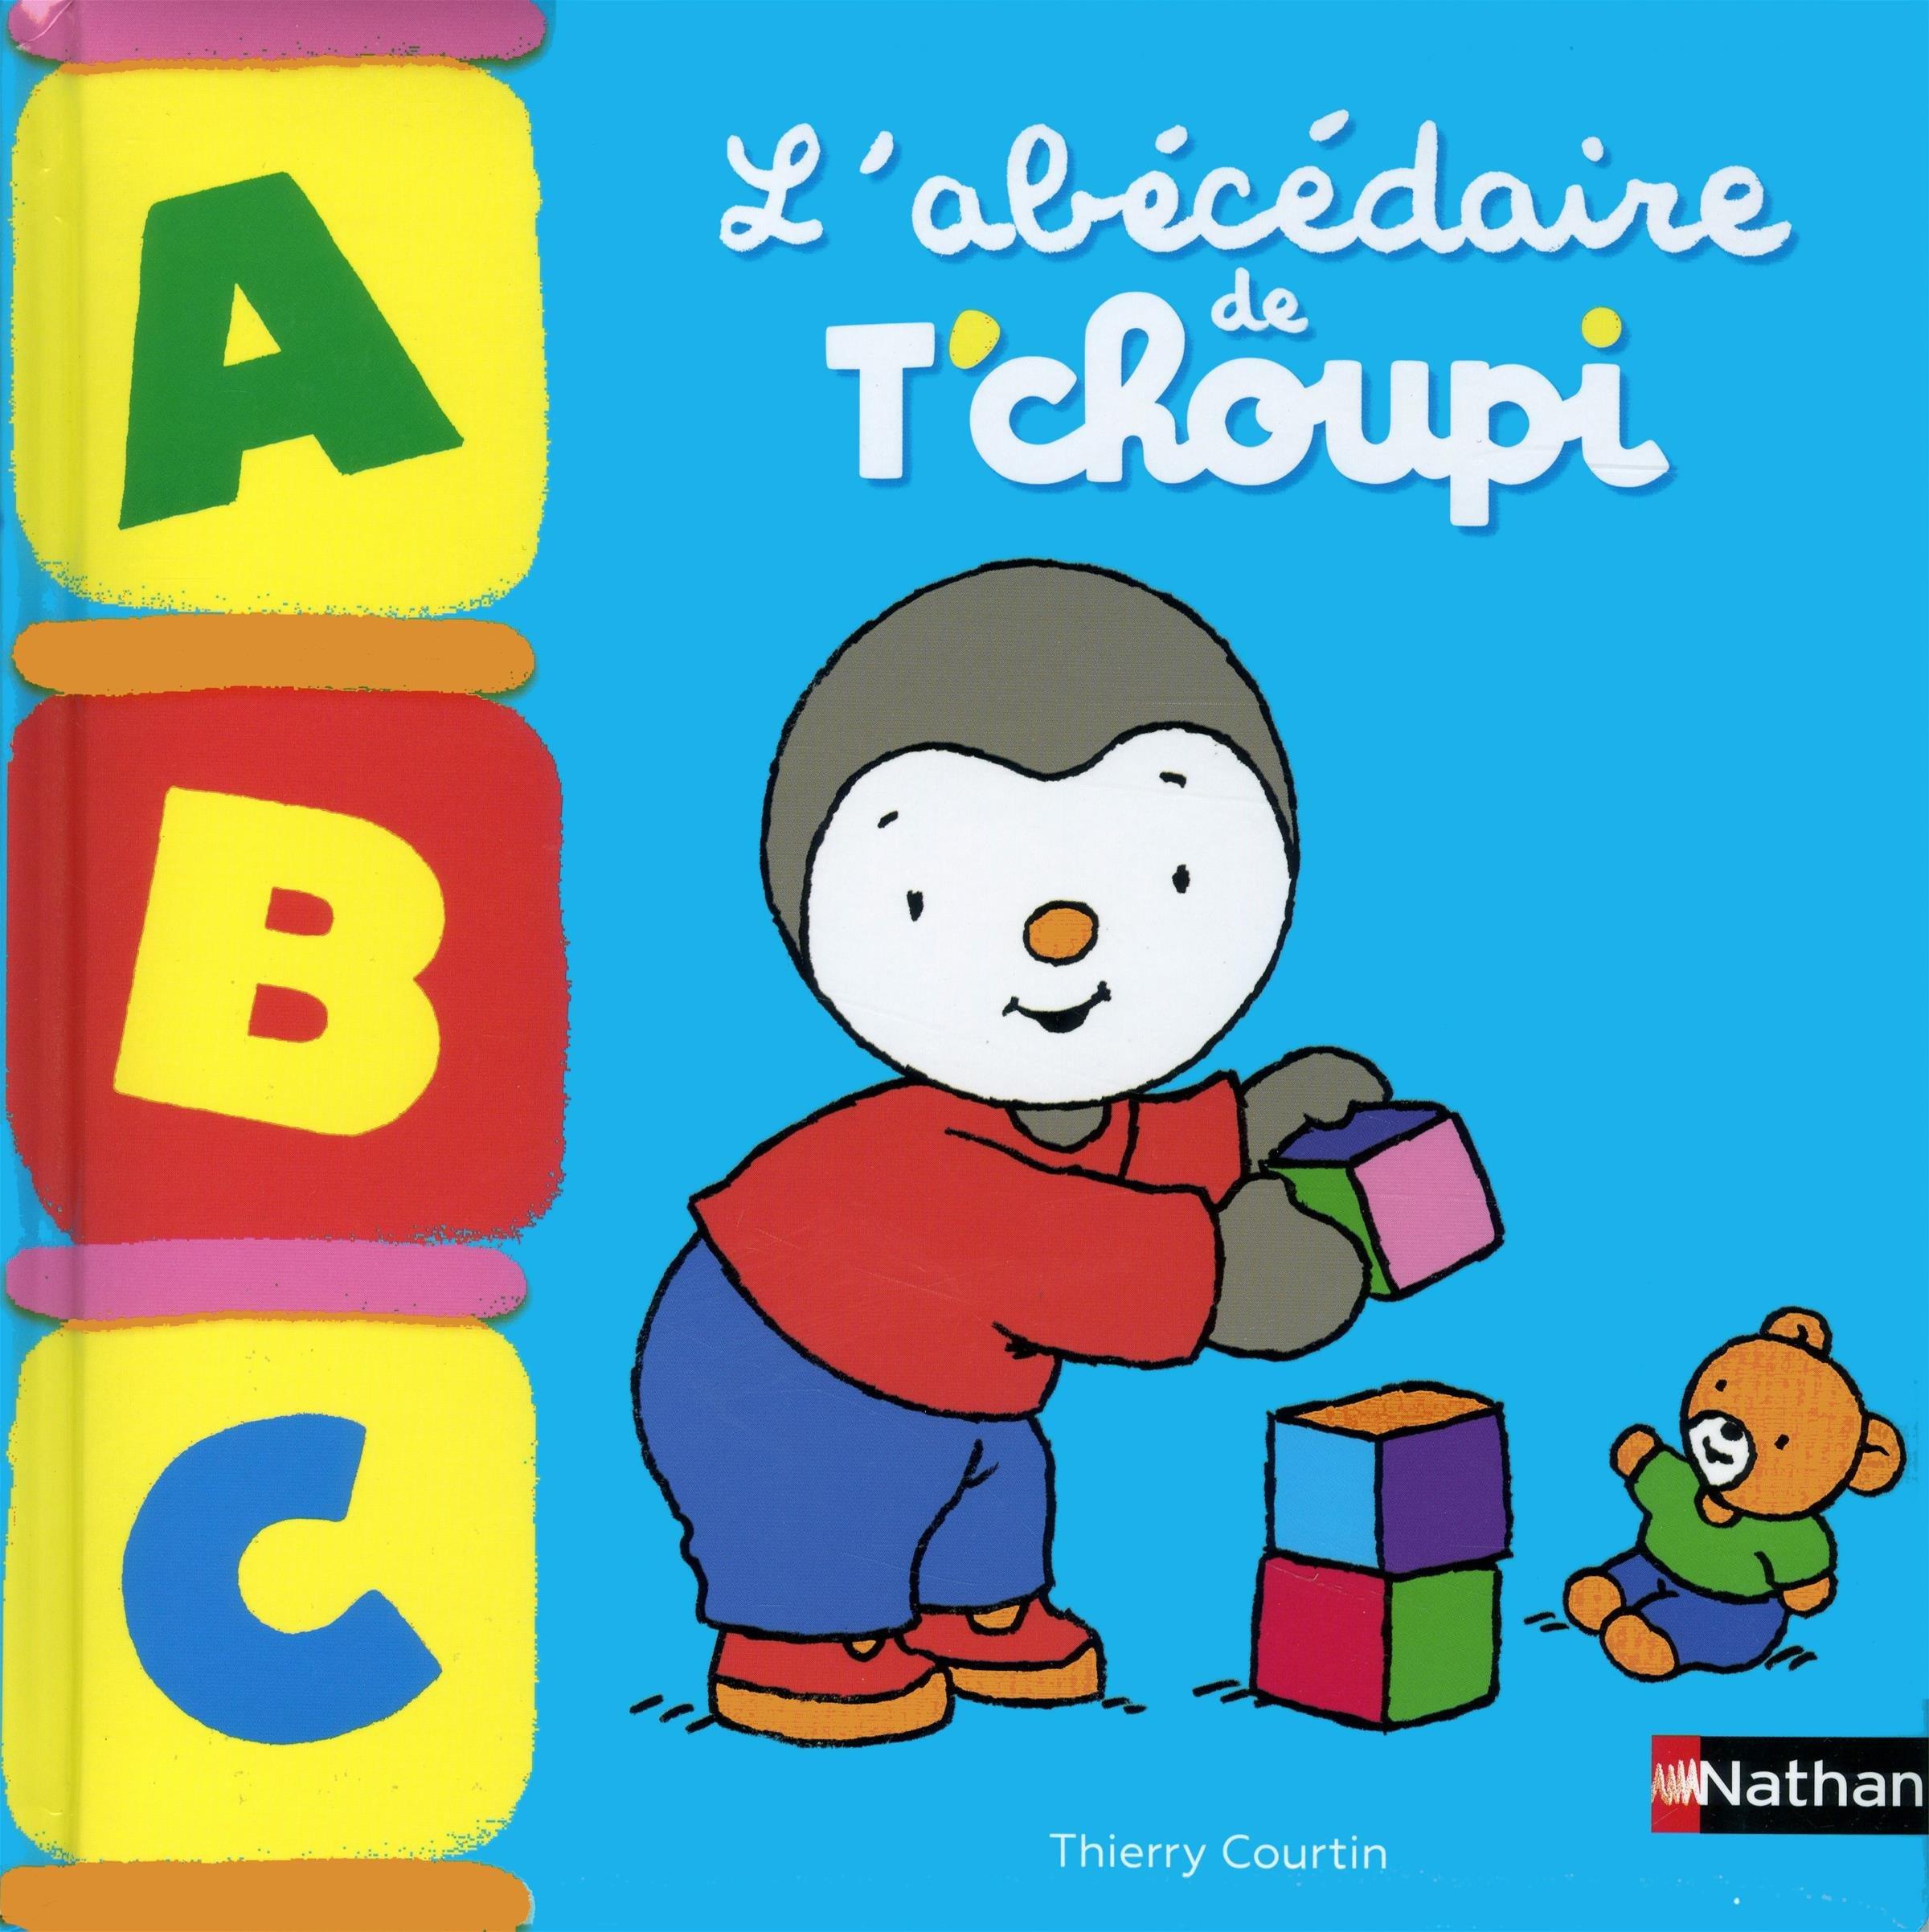 Amazon Com L Abecedaire De T Choupi T Choupi Plus French Edition 9782092580943 Courtin Thierry Books